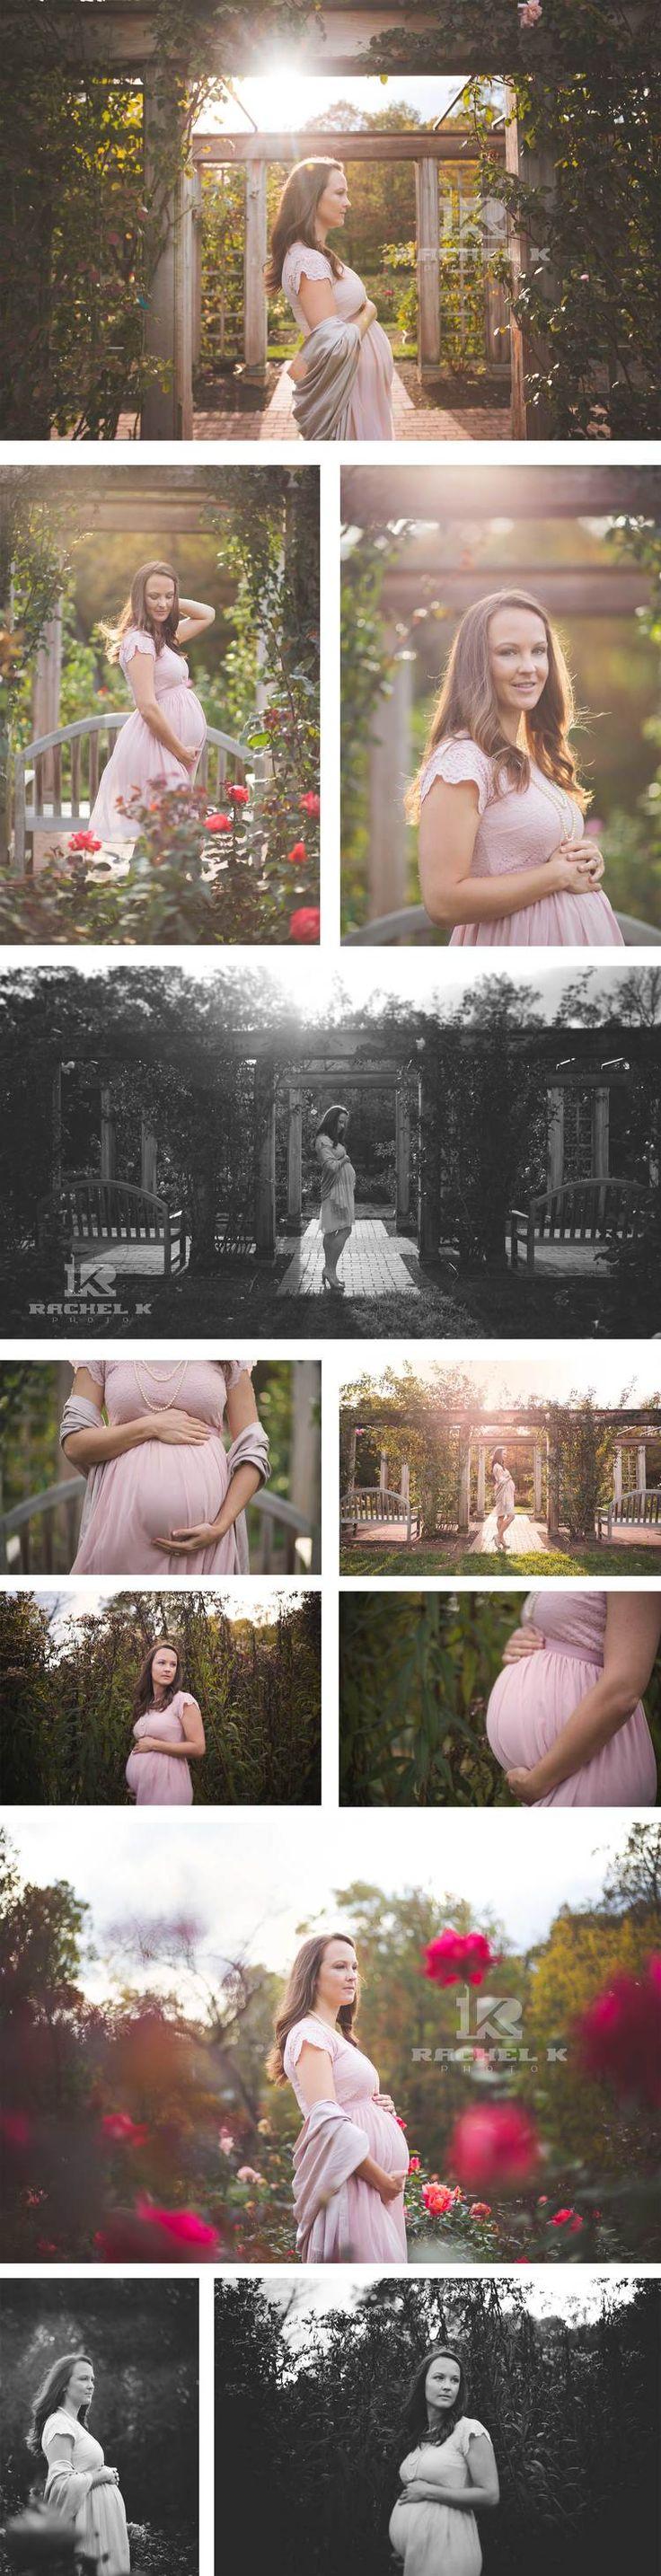 Arlington, VA outdoor maternity photography session feminine romantic northern Virginia lifestyle photography